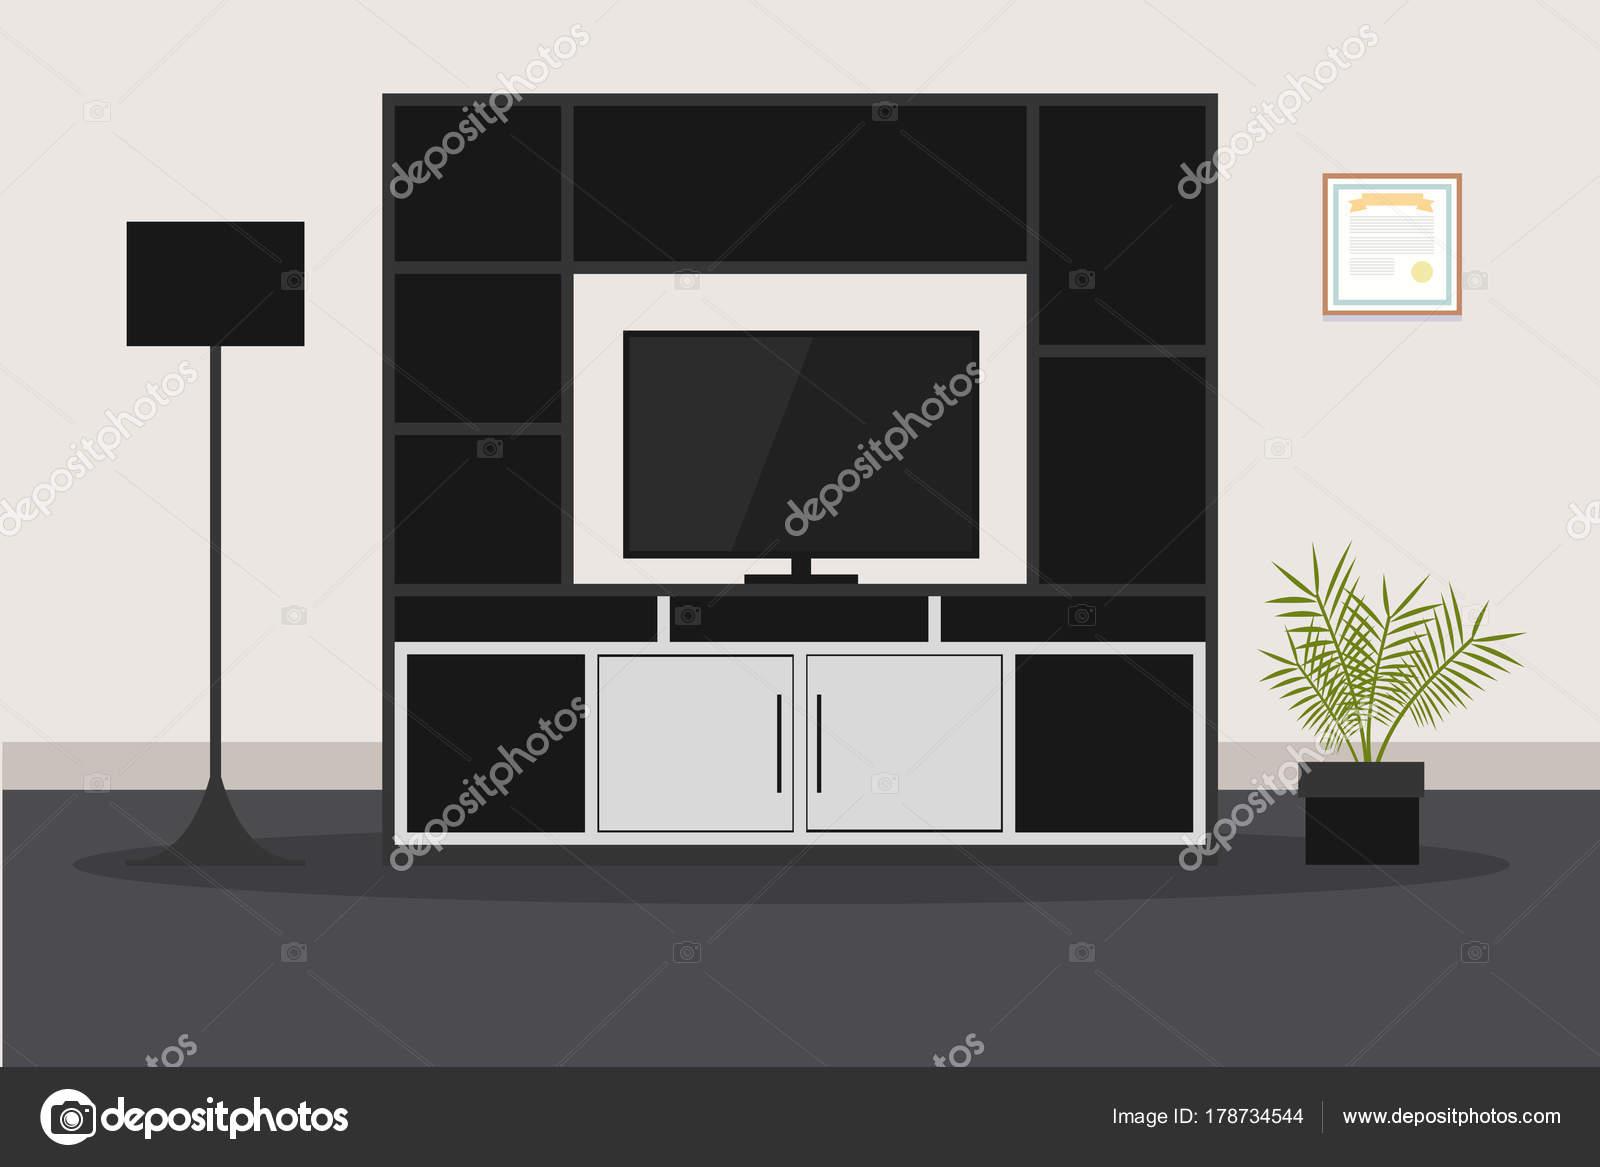 https://st3.depositphotos.com/15430914/17873/v/1600/depositphotos_178734544-stock-illustration-design-modern-furniture-living-room.jpg